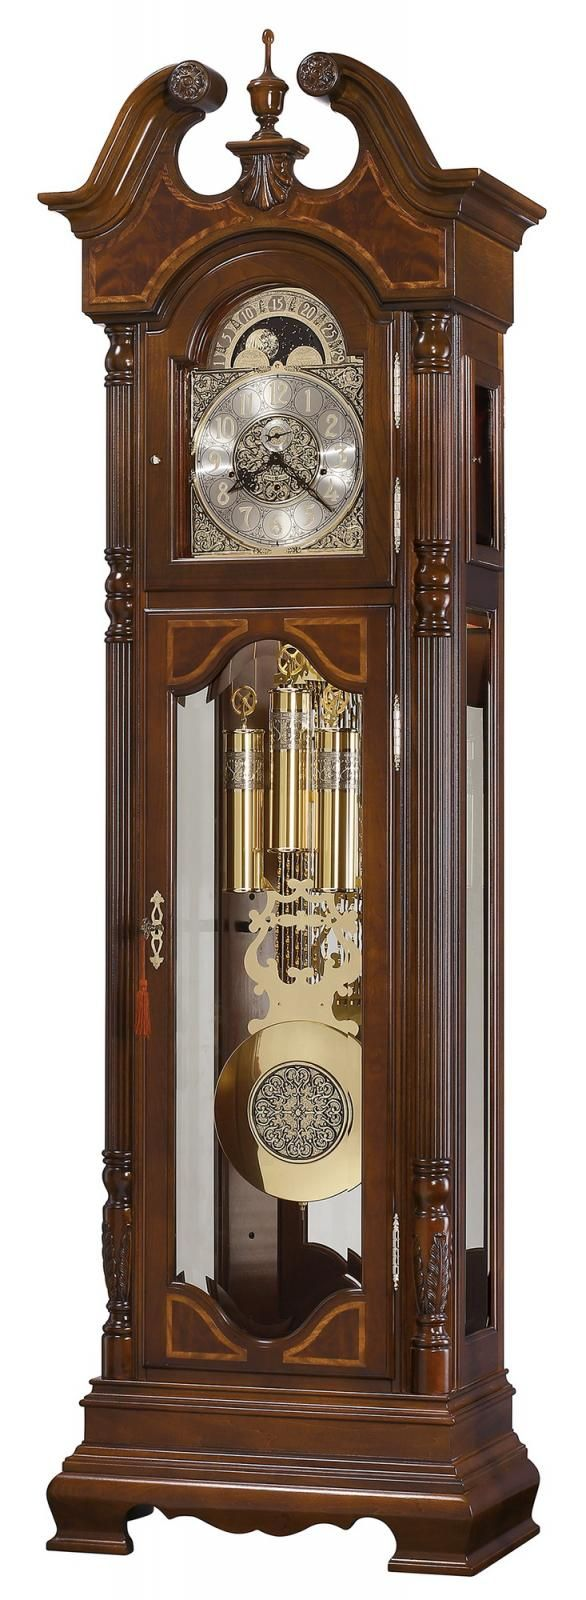 Howard Miller Chm4278 Mechanical Chiming Presidential Grandfather Clock Grandfather Clock Clock Antique Wall Clock